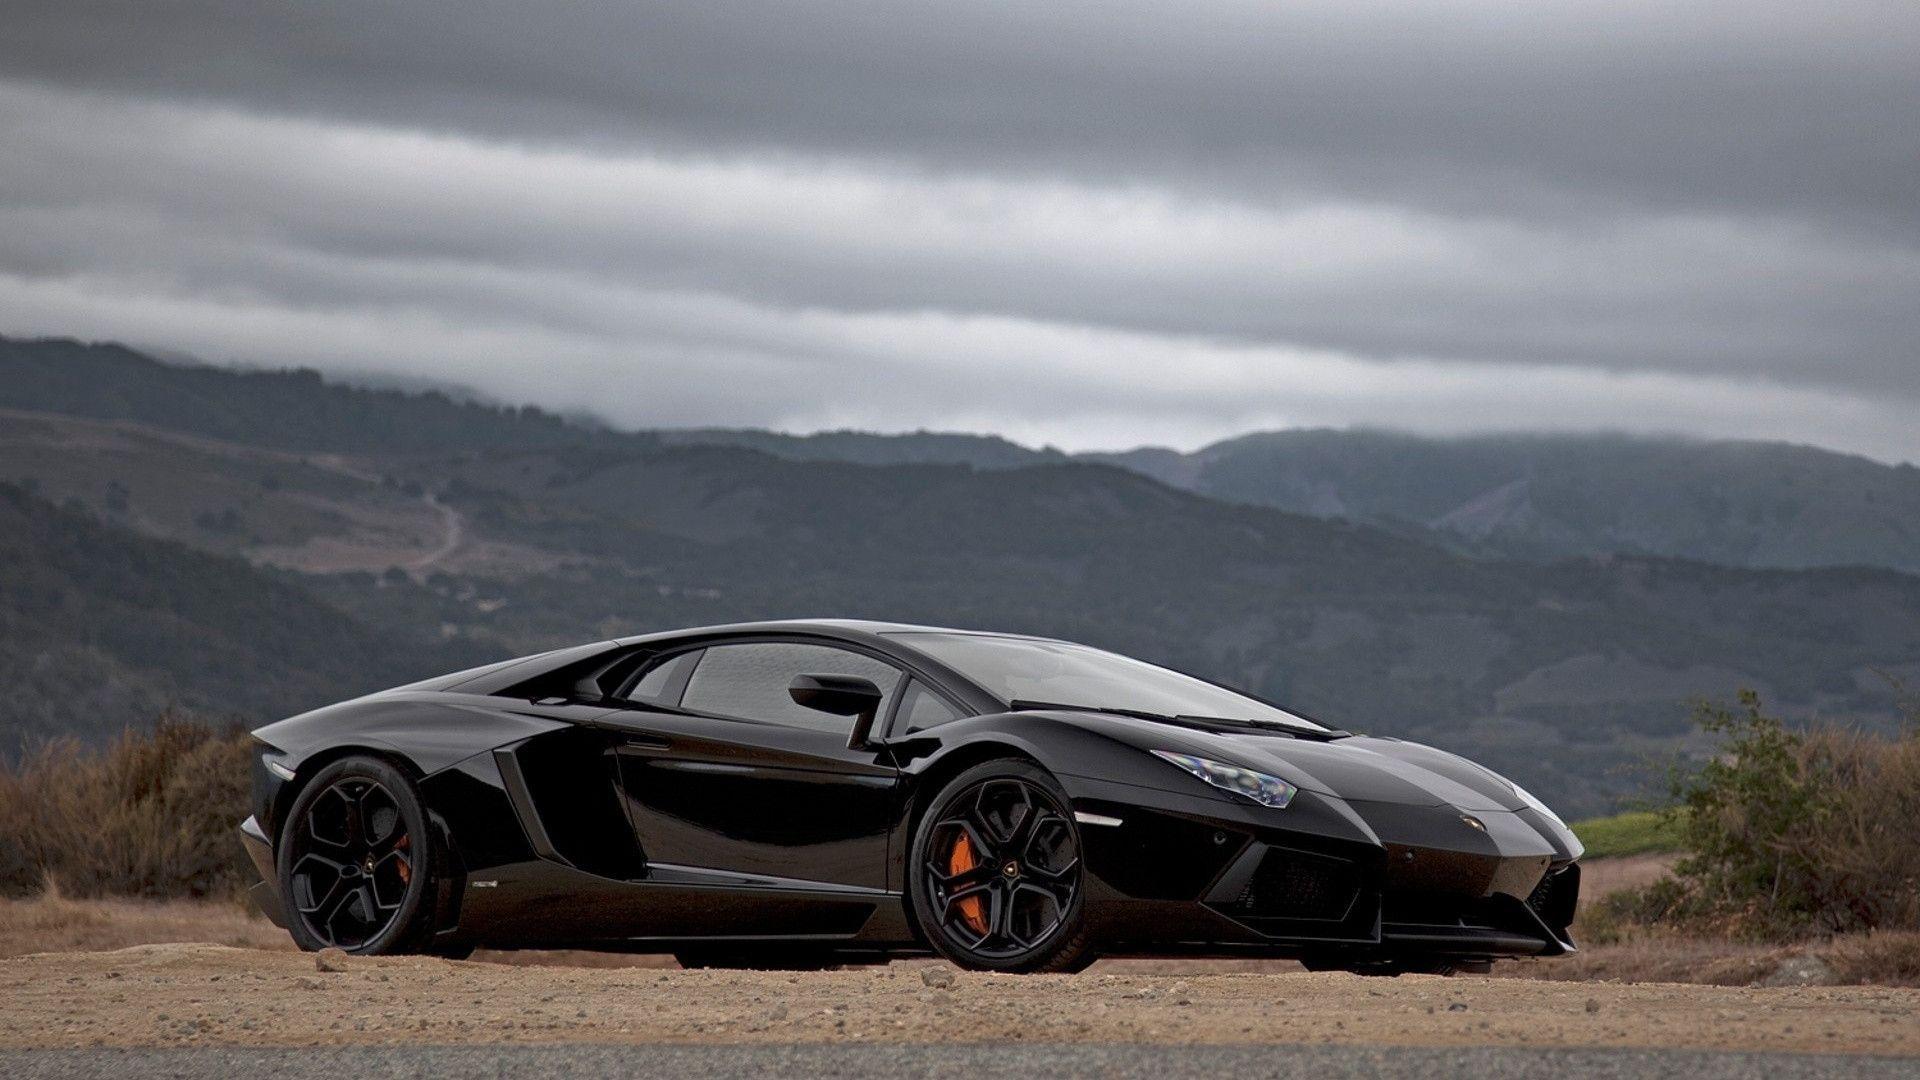 lamborghini huracan matte black wallpaper 1080p taboratcom - Lamborghini Huracan Hd Wallpapers 1080p